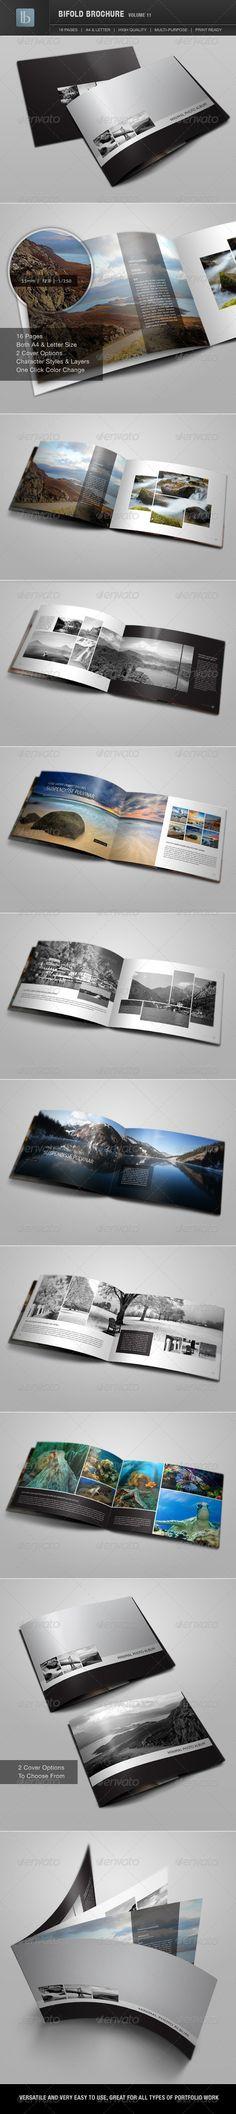 Bifold Brochure   Volume 11 - GraphicRiver Item for Sale